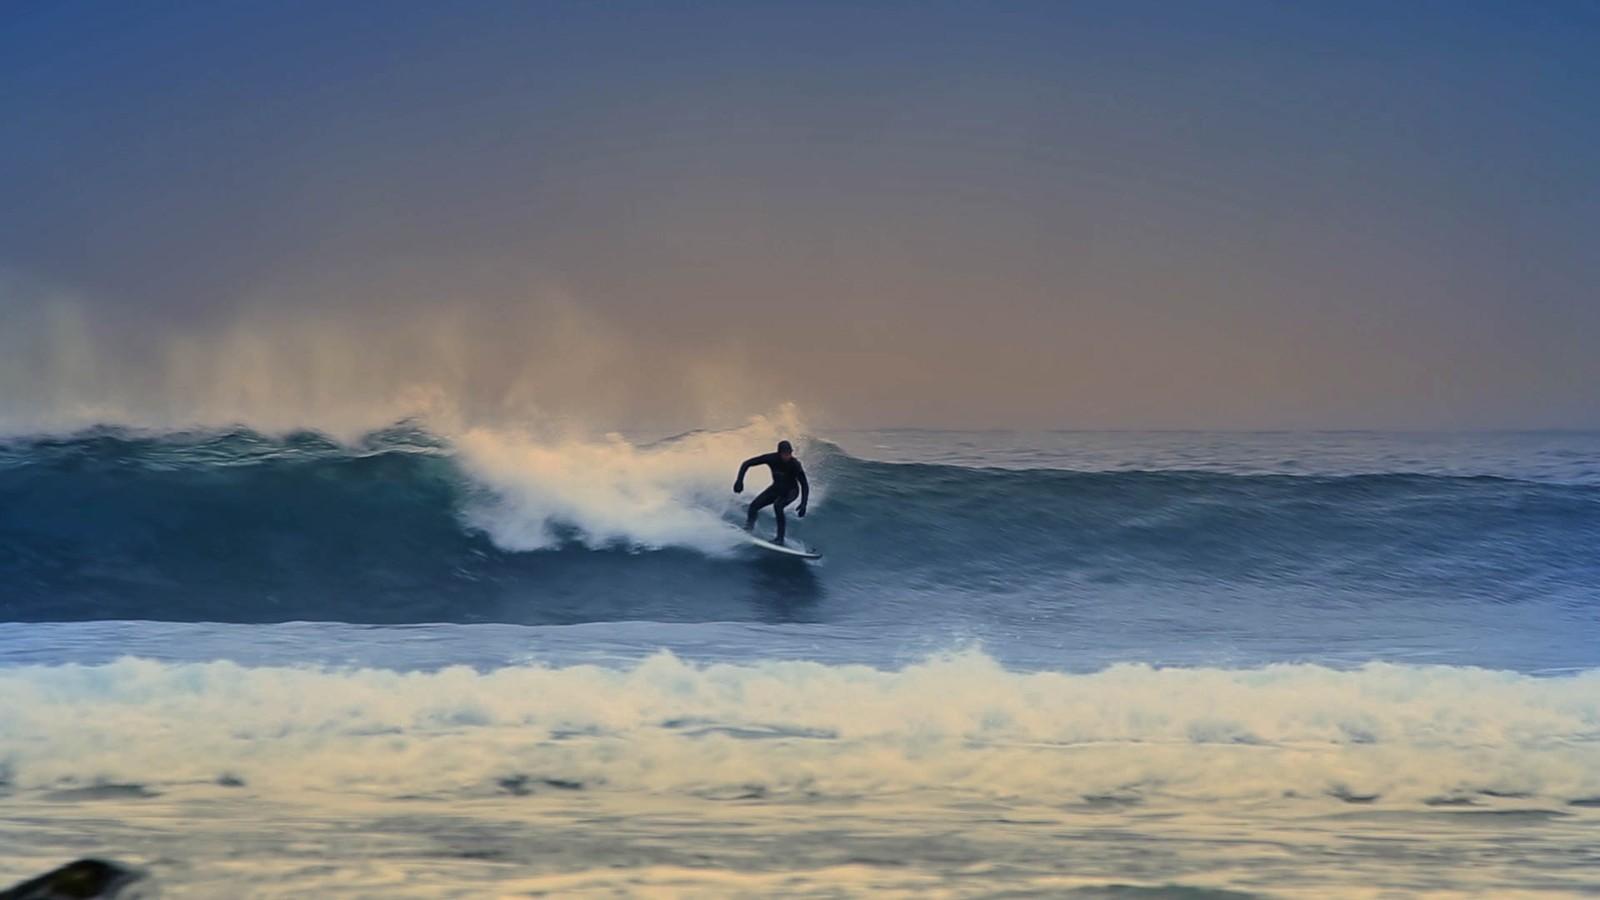 Surfing i Vesterålen.